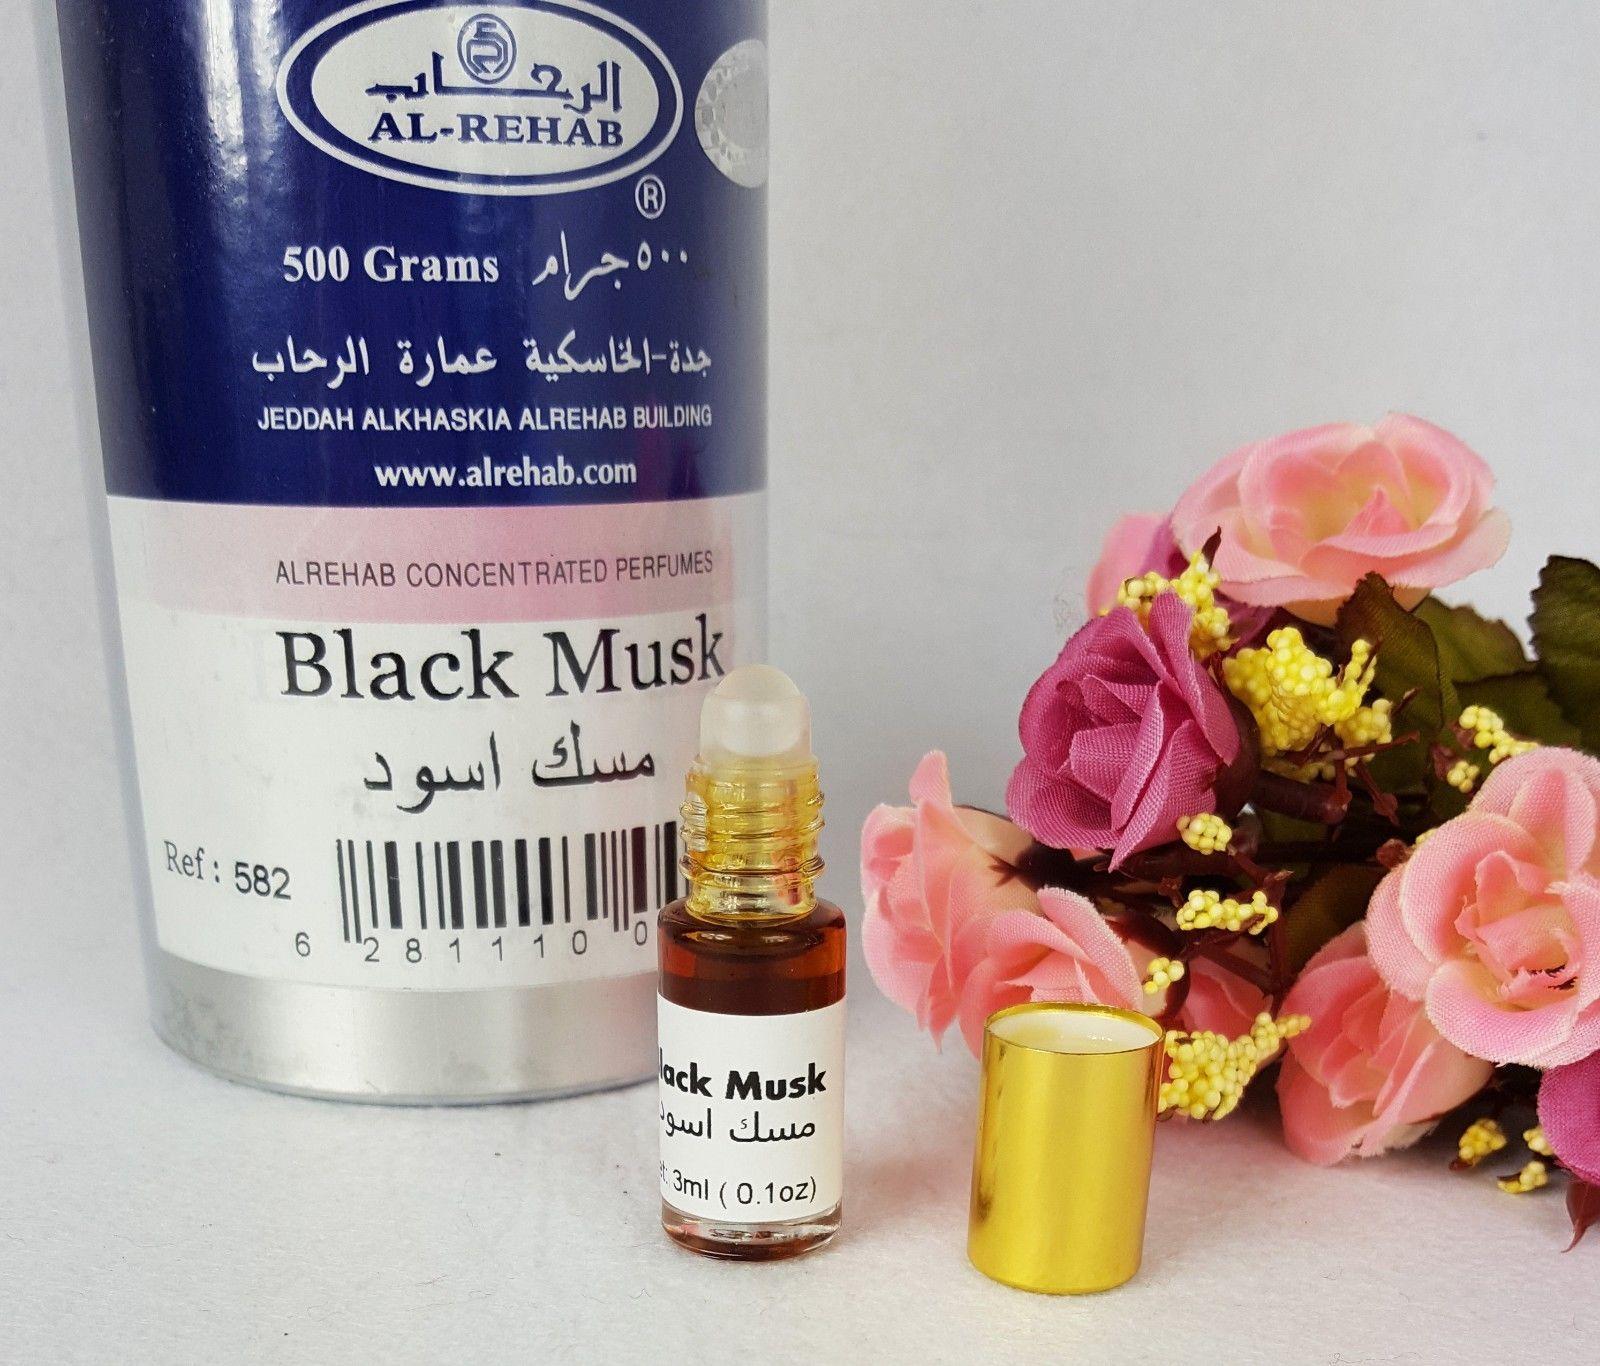 Al Rehab Black Musk Oil Perfume Wild Deer Base Roll On 3ml Parfum White Minyak Wangi